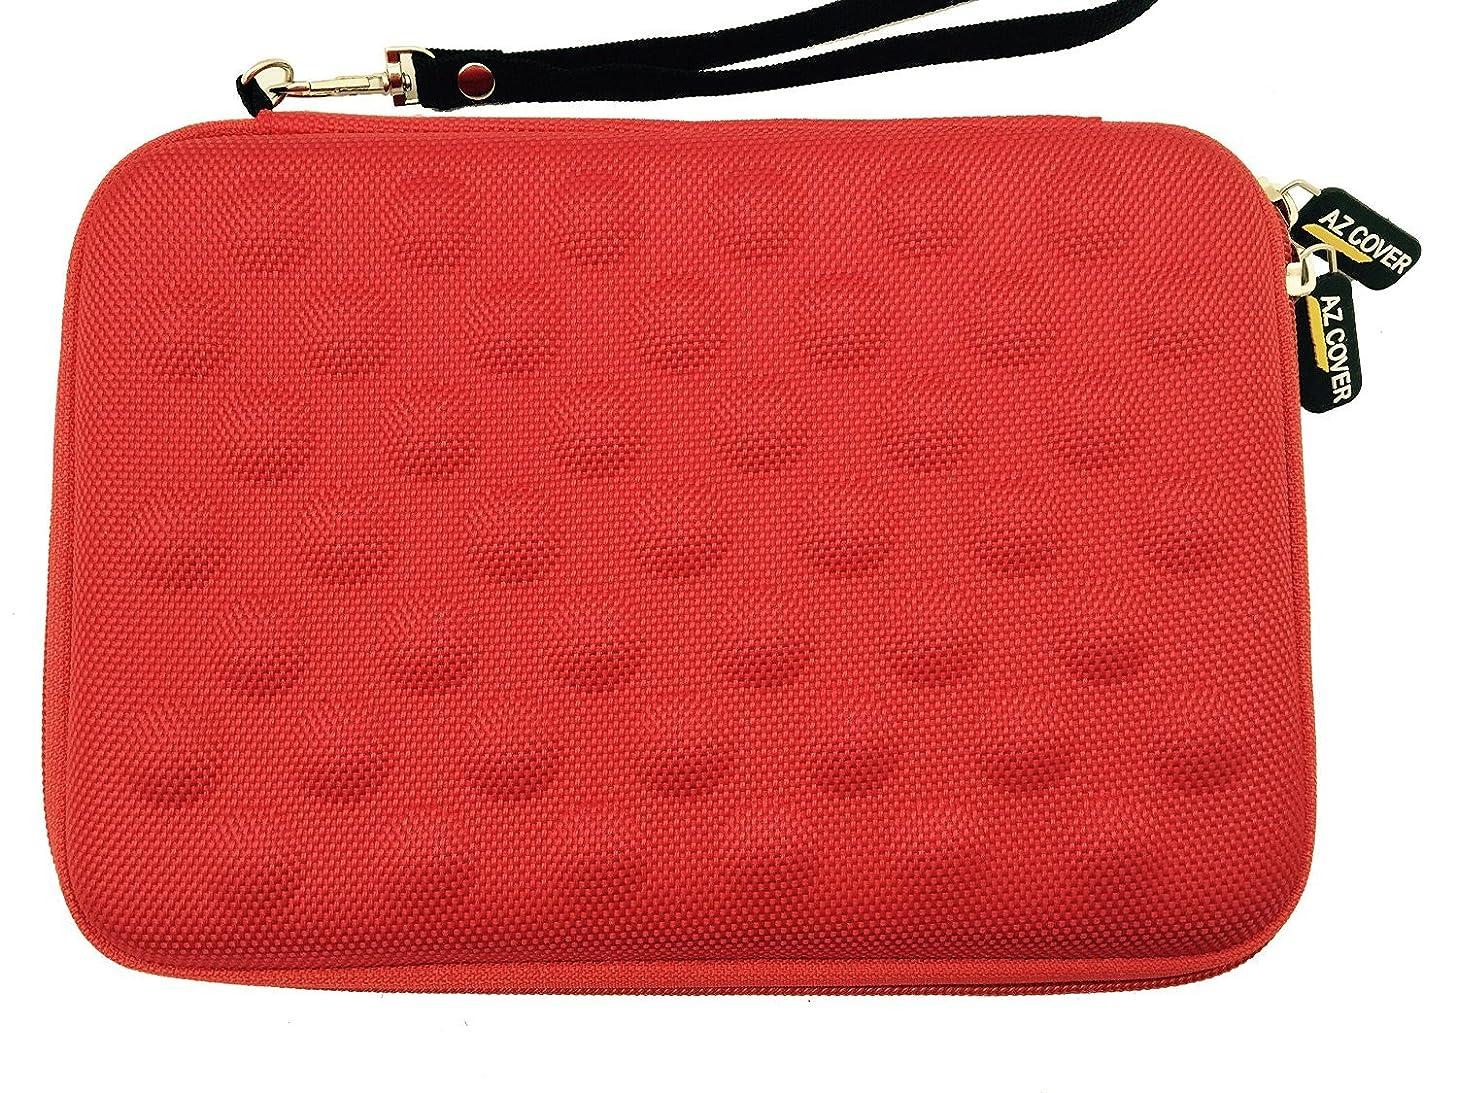 AZ-Cover 7-Inch Tablet Semi-rigid EVA Bubble Foam Case (Red) With Wrist Strap For iRULU P2 7